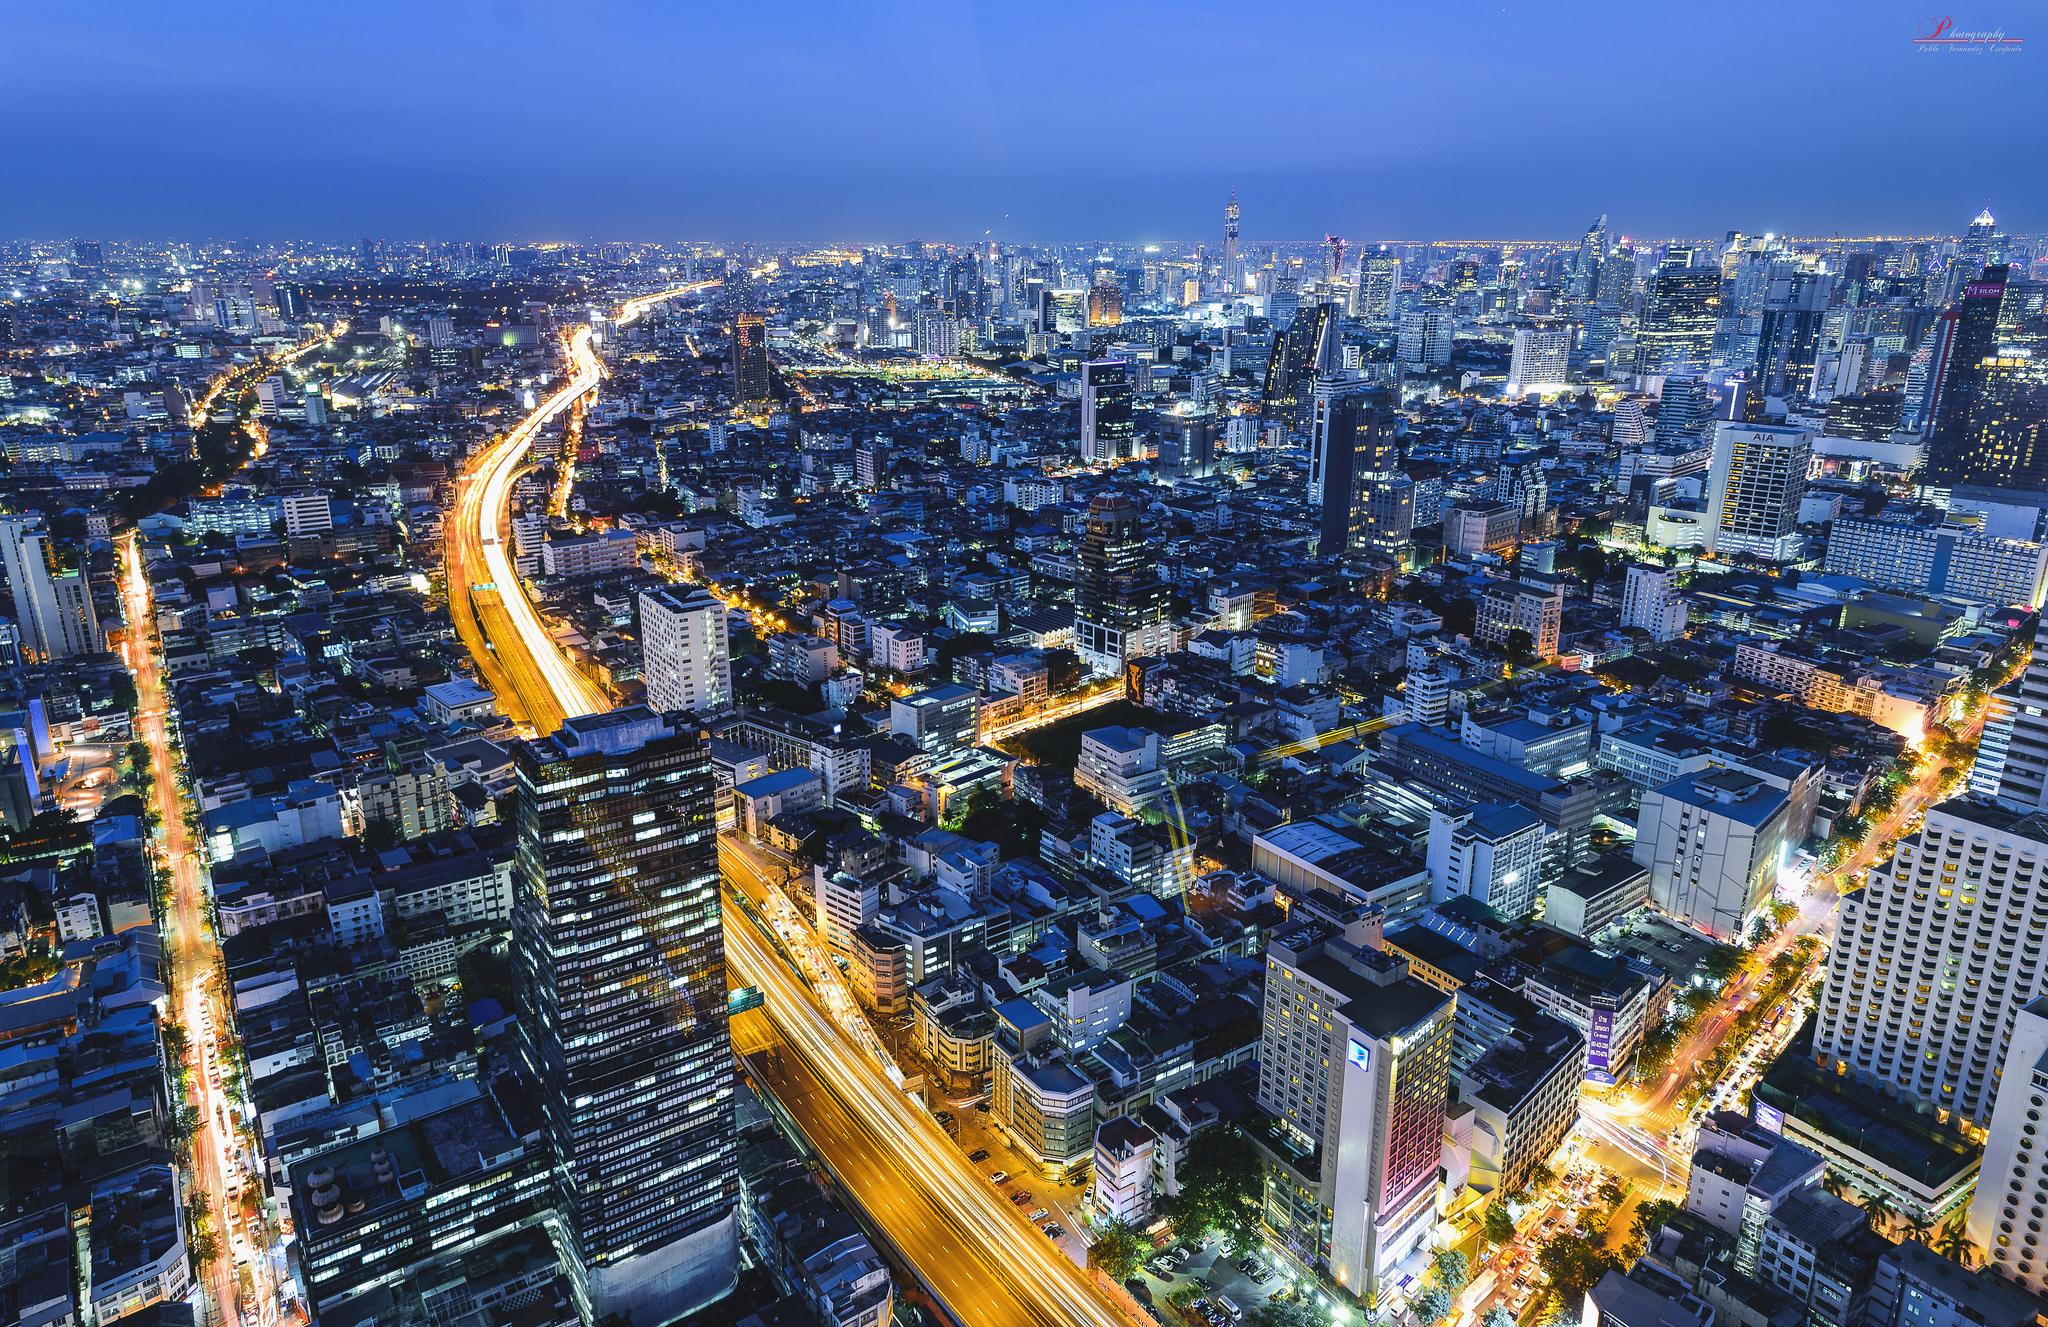 Overlooking Bangkok at night. Image credit:  Pablo Fernández / Creative Commons